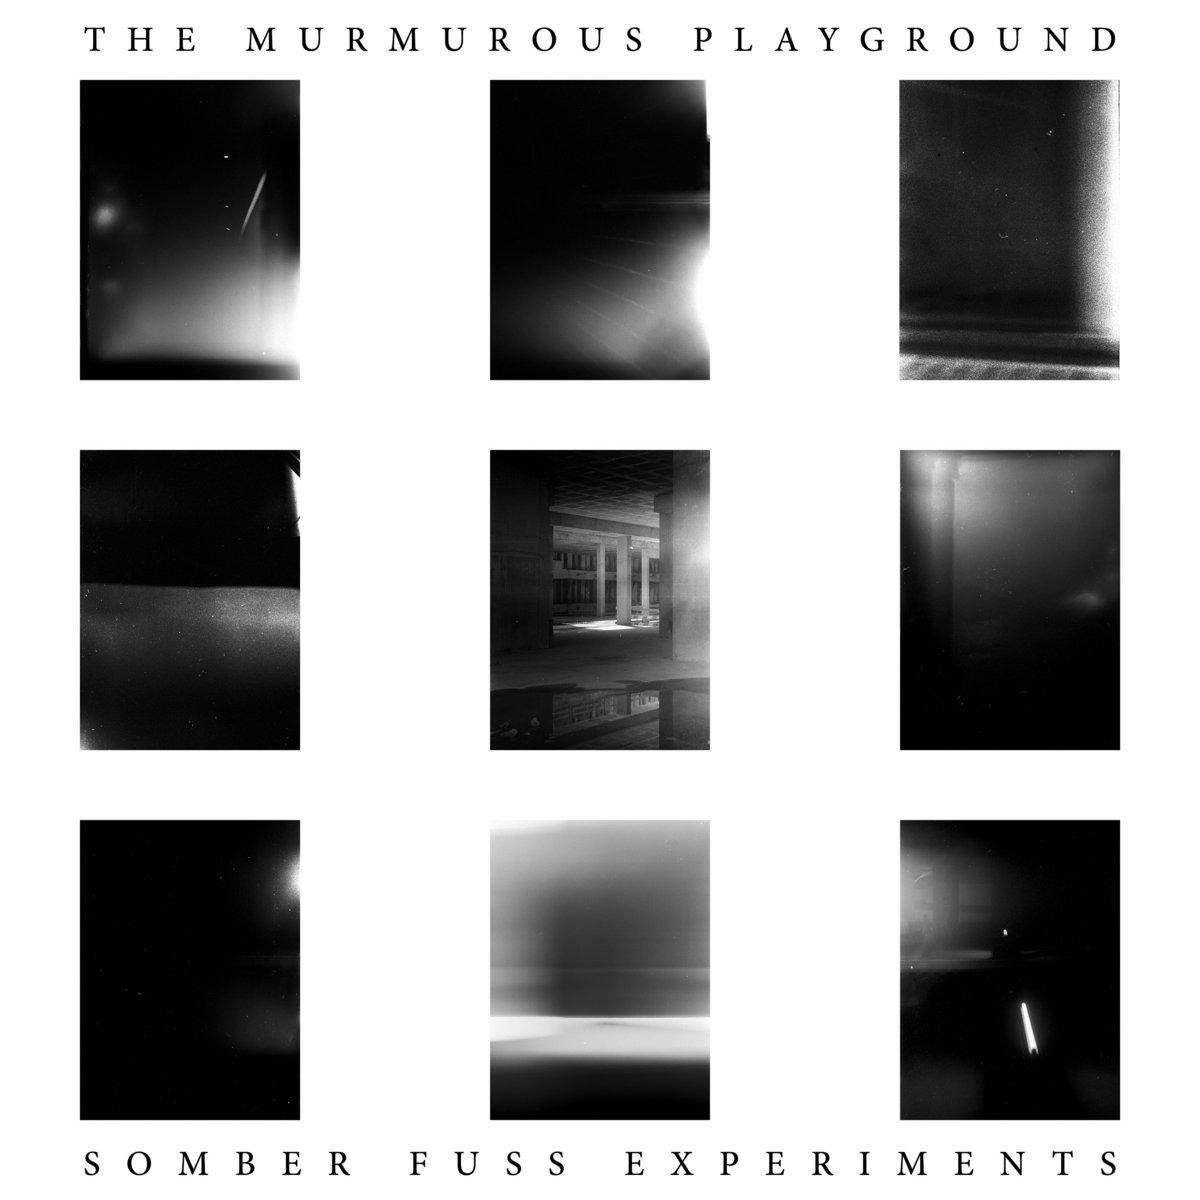 THE MURMUROUS PLAYGROUND – Somber Fuss Experiments